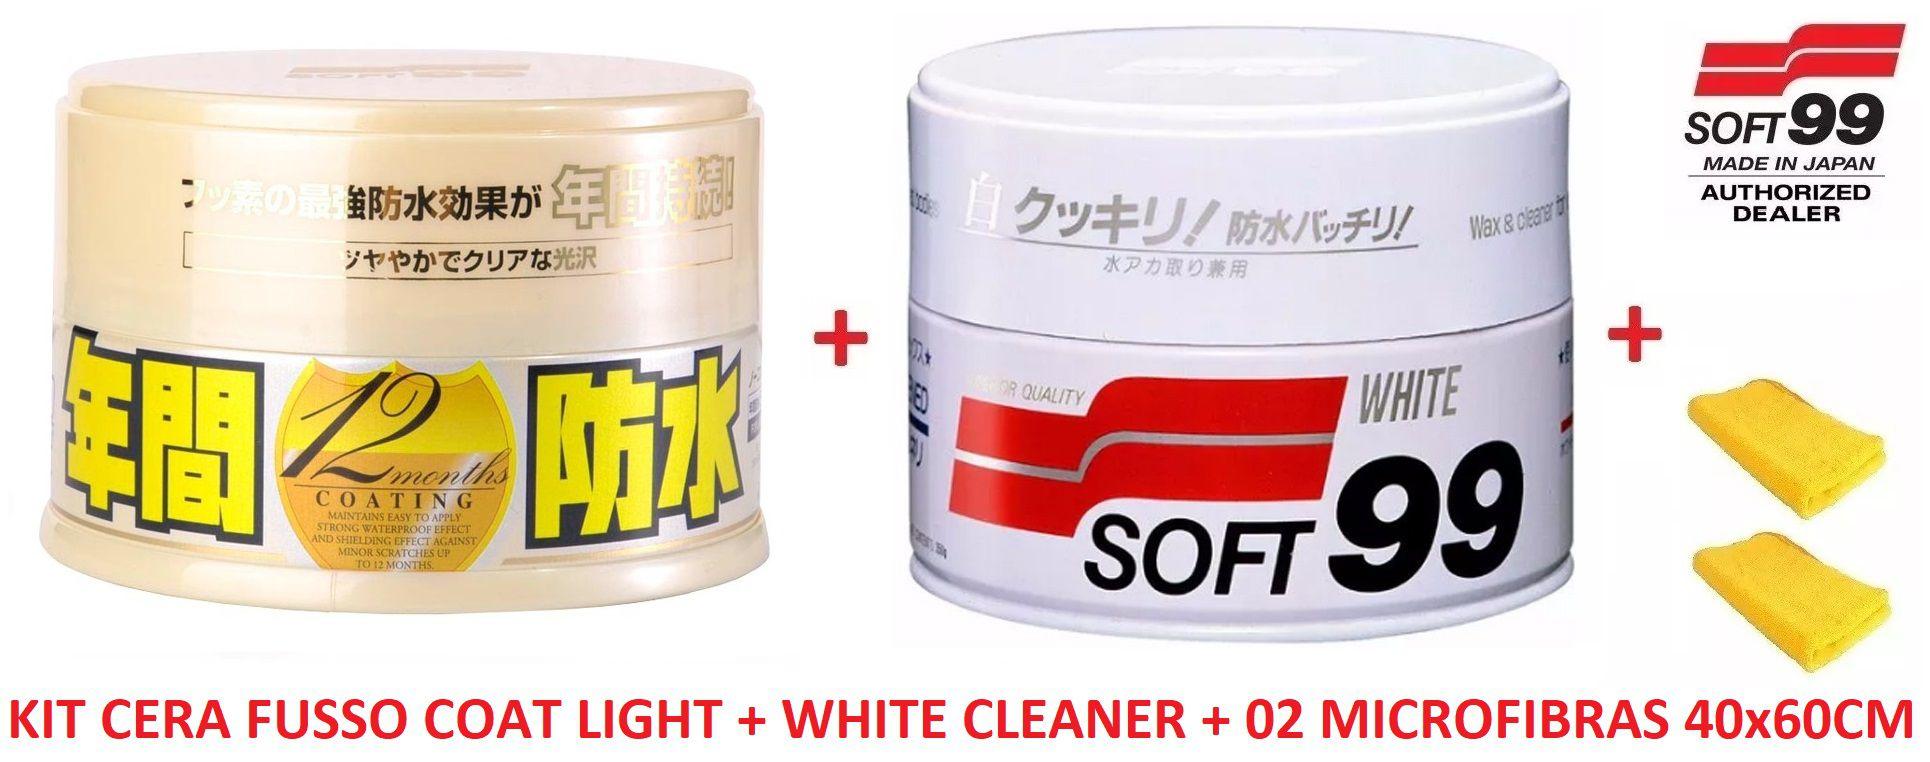 Kit c/ Cera Carnaúba Carros Brancos 350g Soft99 White Wax Cleaner + Cera Fusso Coat Soft99 Light Carros Cores Claras 200g Branca + 02 MICROFIBRAS 40X60